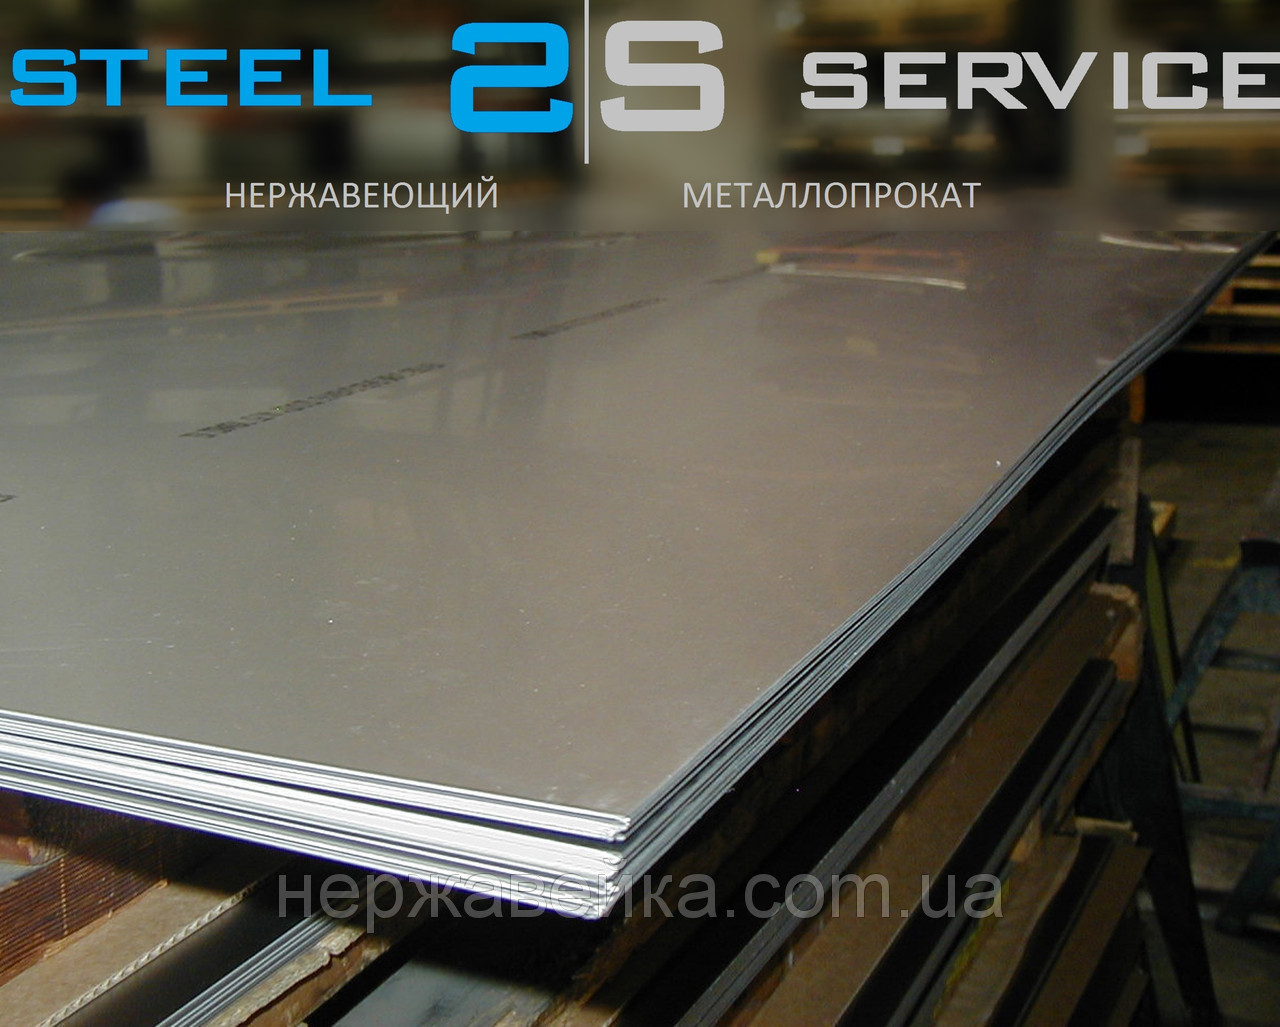 Нержавейка лист 5х1000х2000мм  AISI 316L(03Х17Н14М3) F1 - горячекатанный,  кислотостойкий